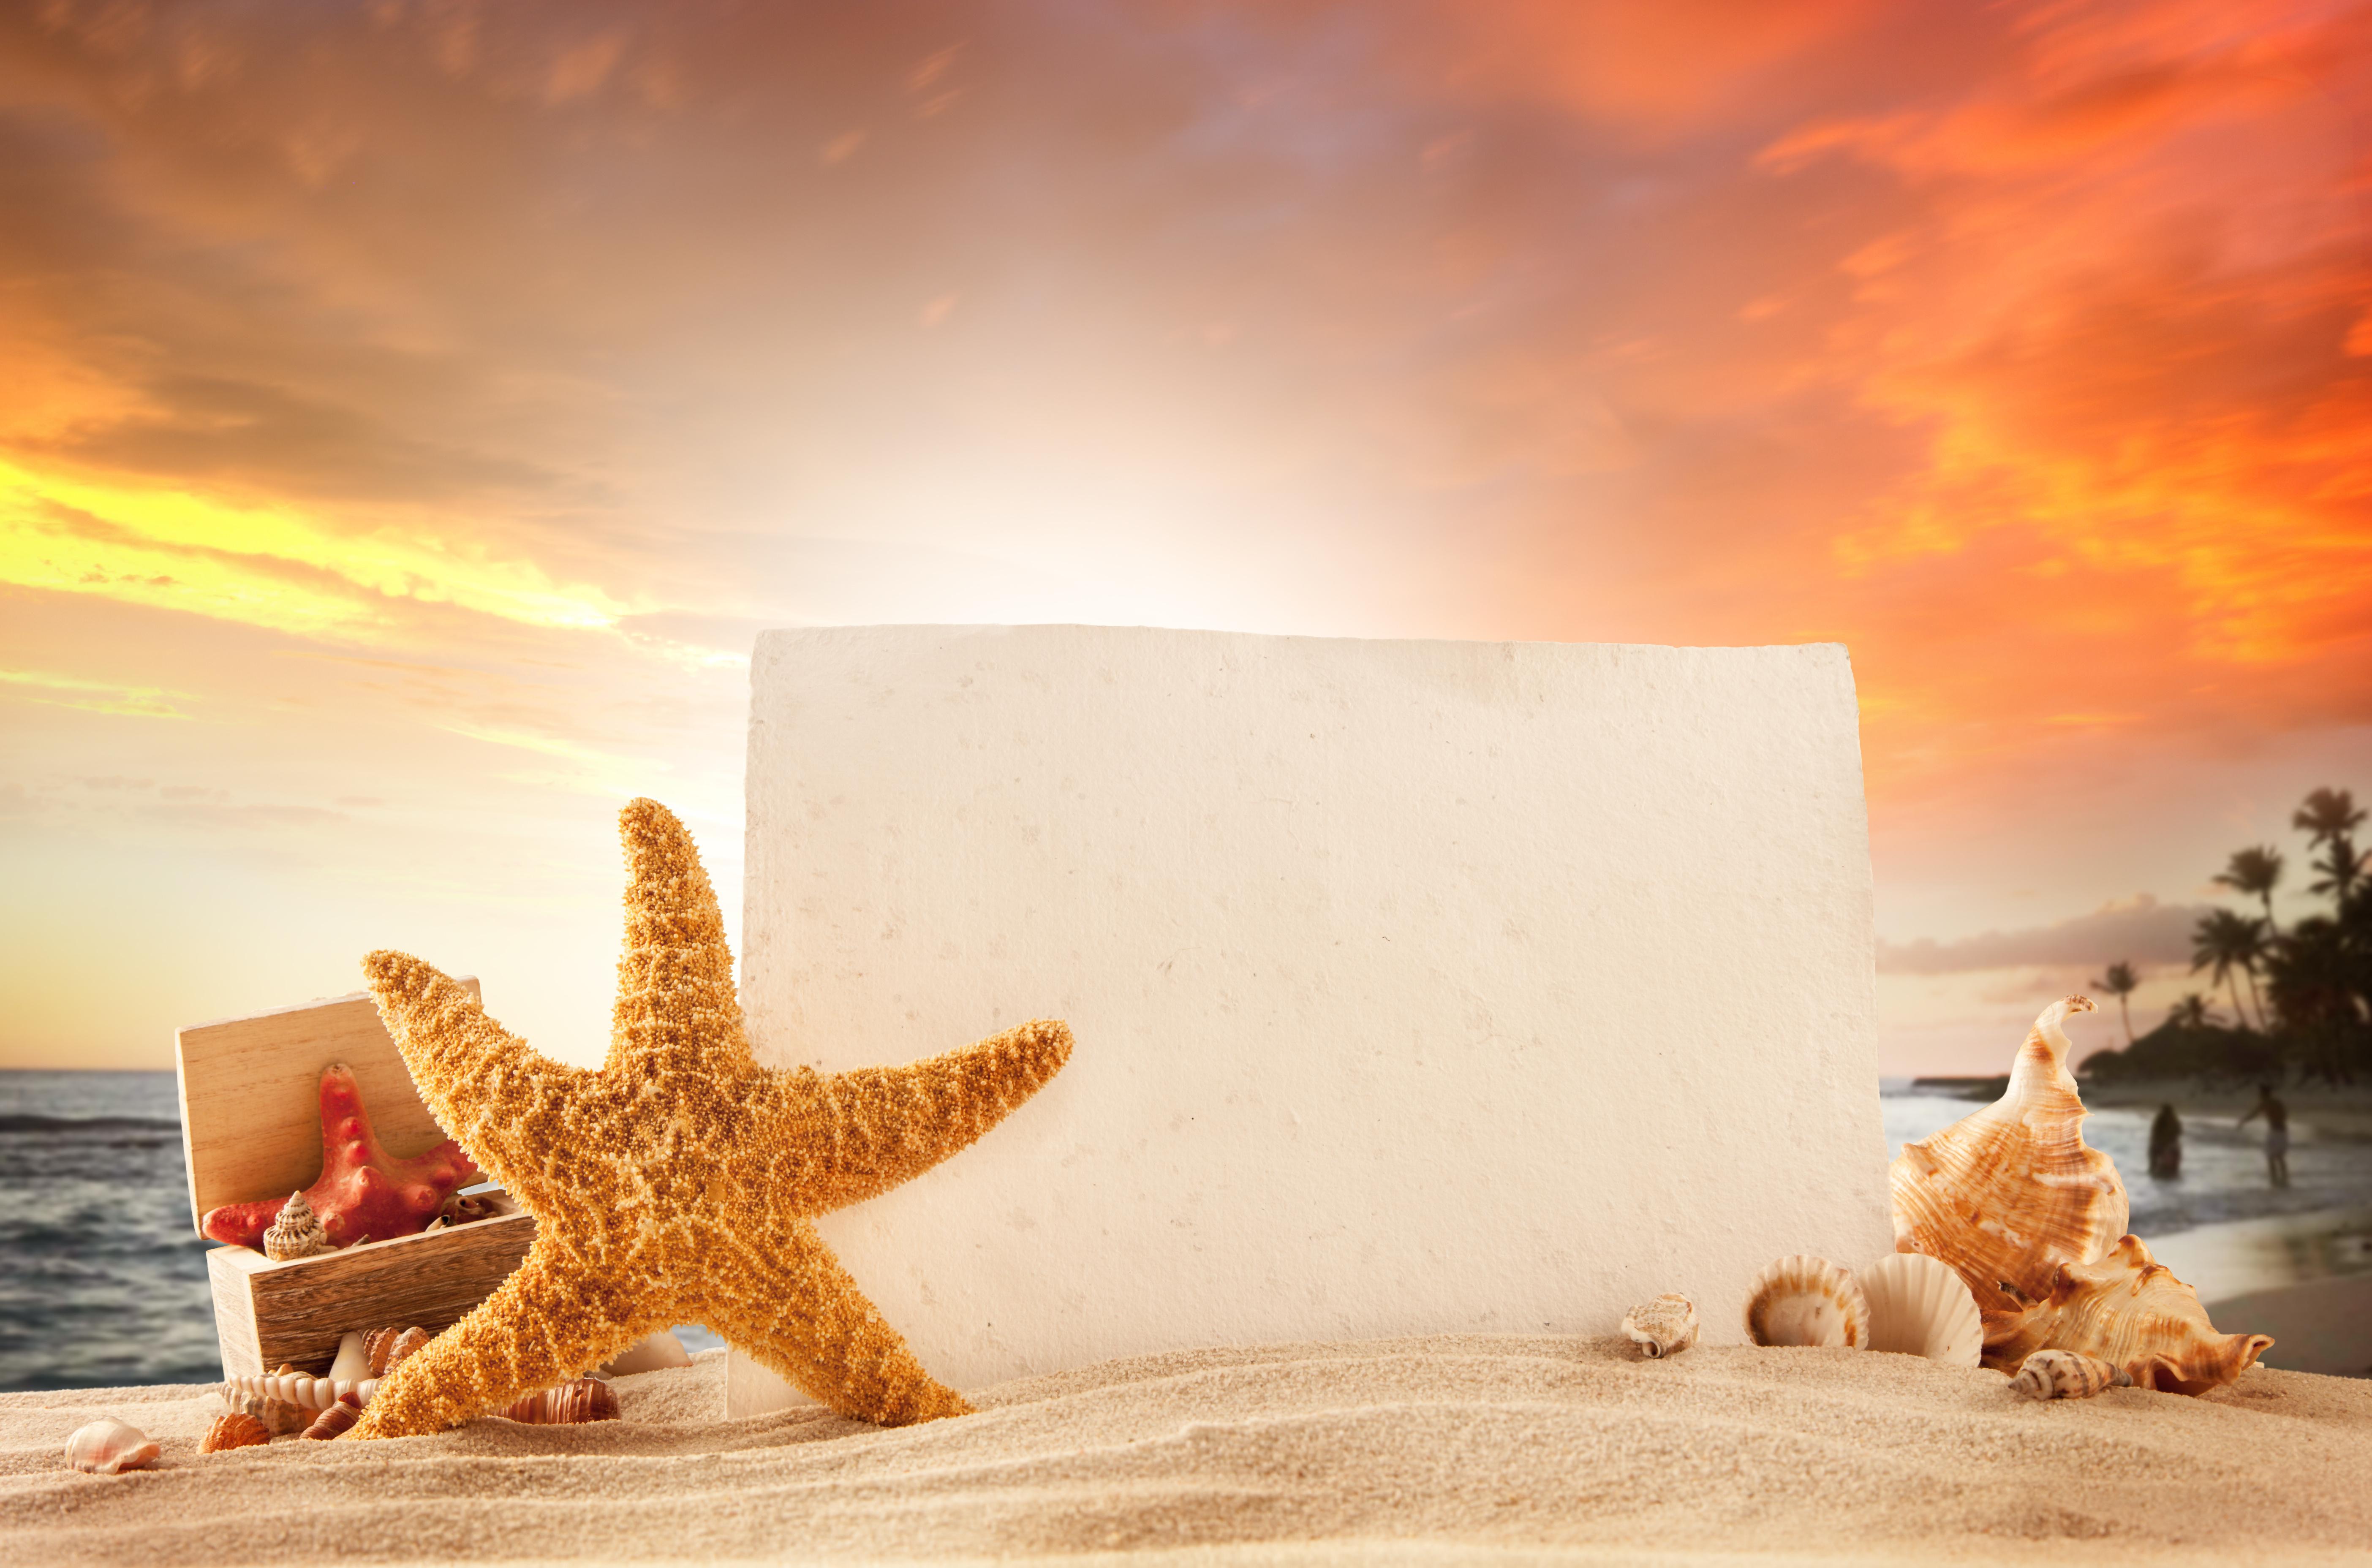 starfish beach sand summer sea vacation sun wallpapers photos